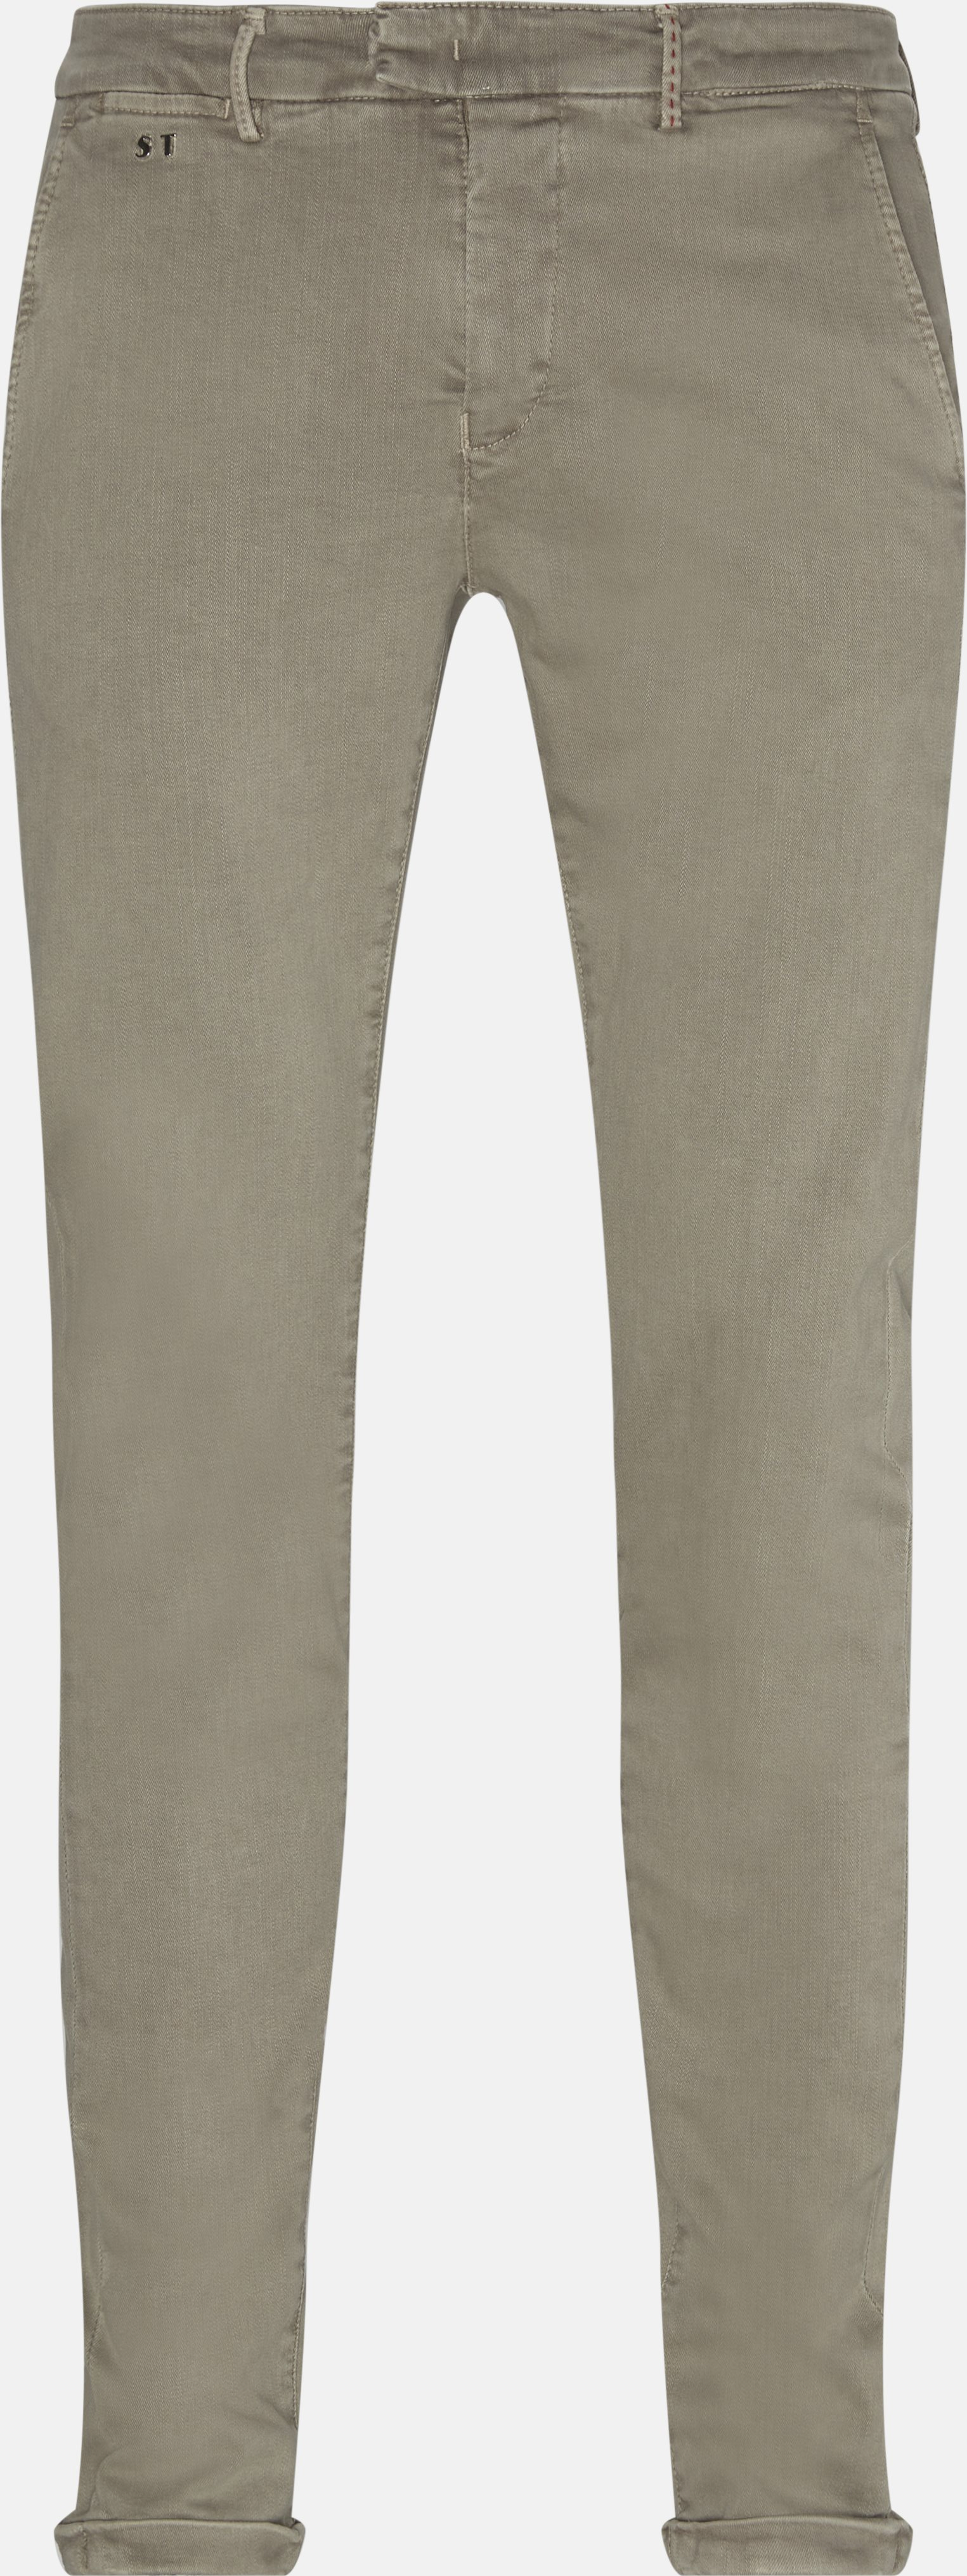 Bukser - Slim - Sand